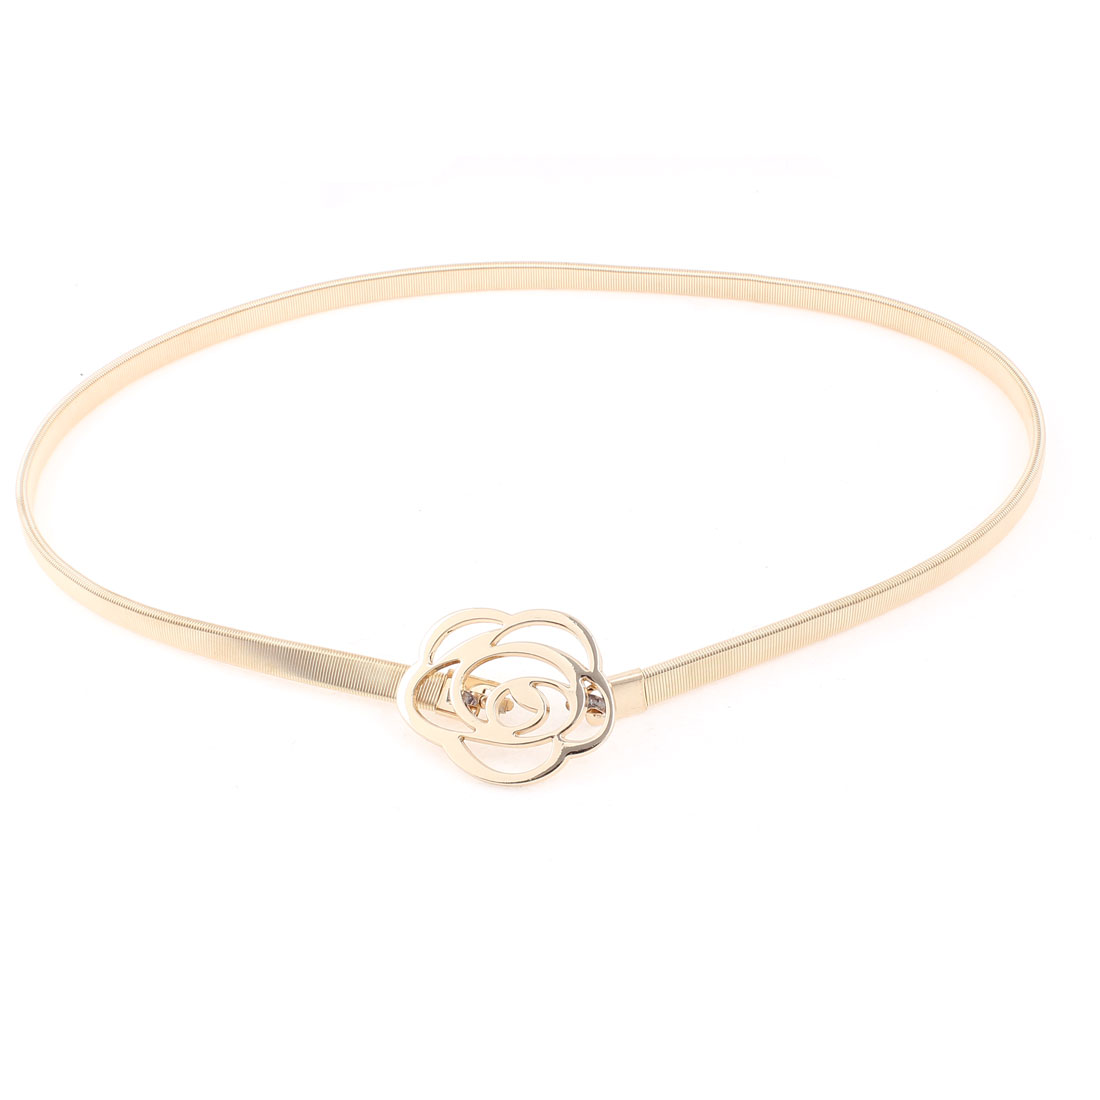 Flower Shape Interlocking Buckle Slim Waistband Waist Chain Gold Tone for Women